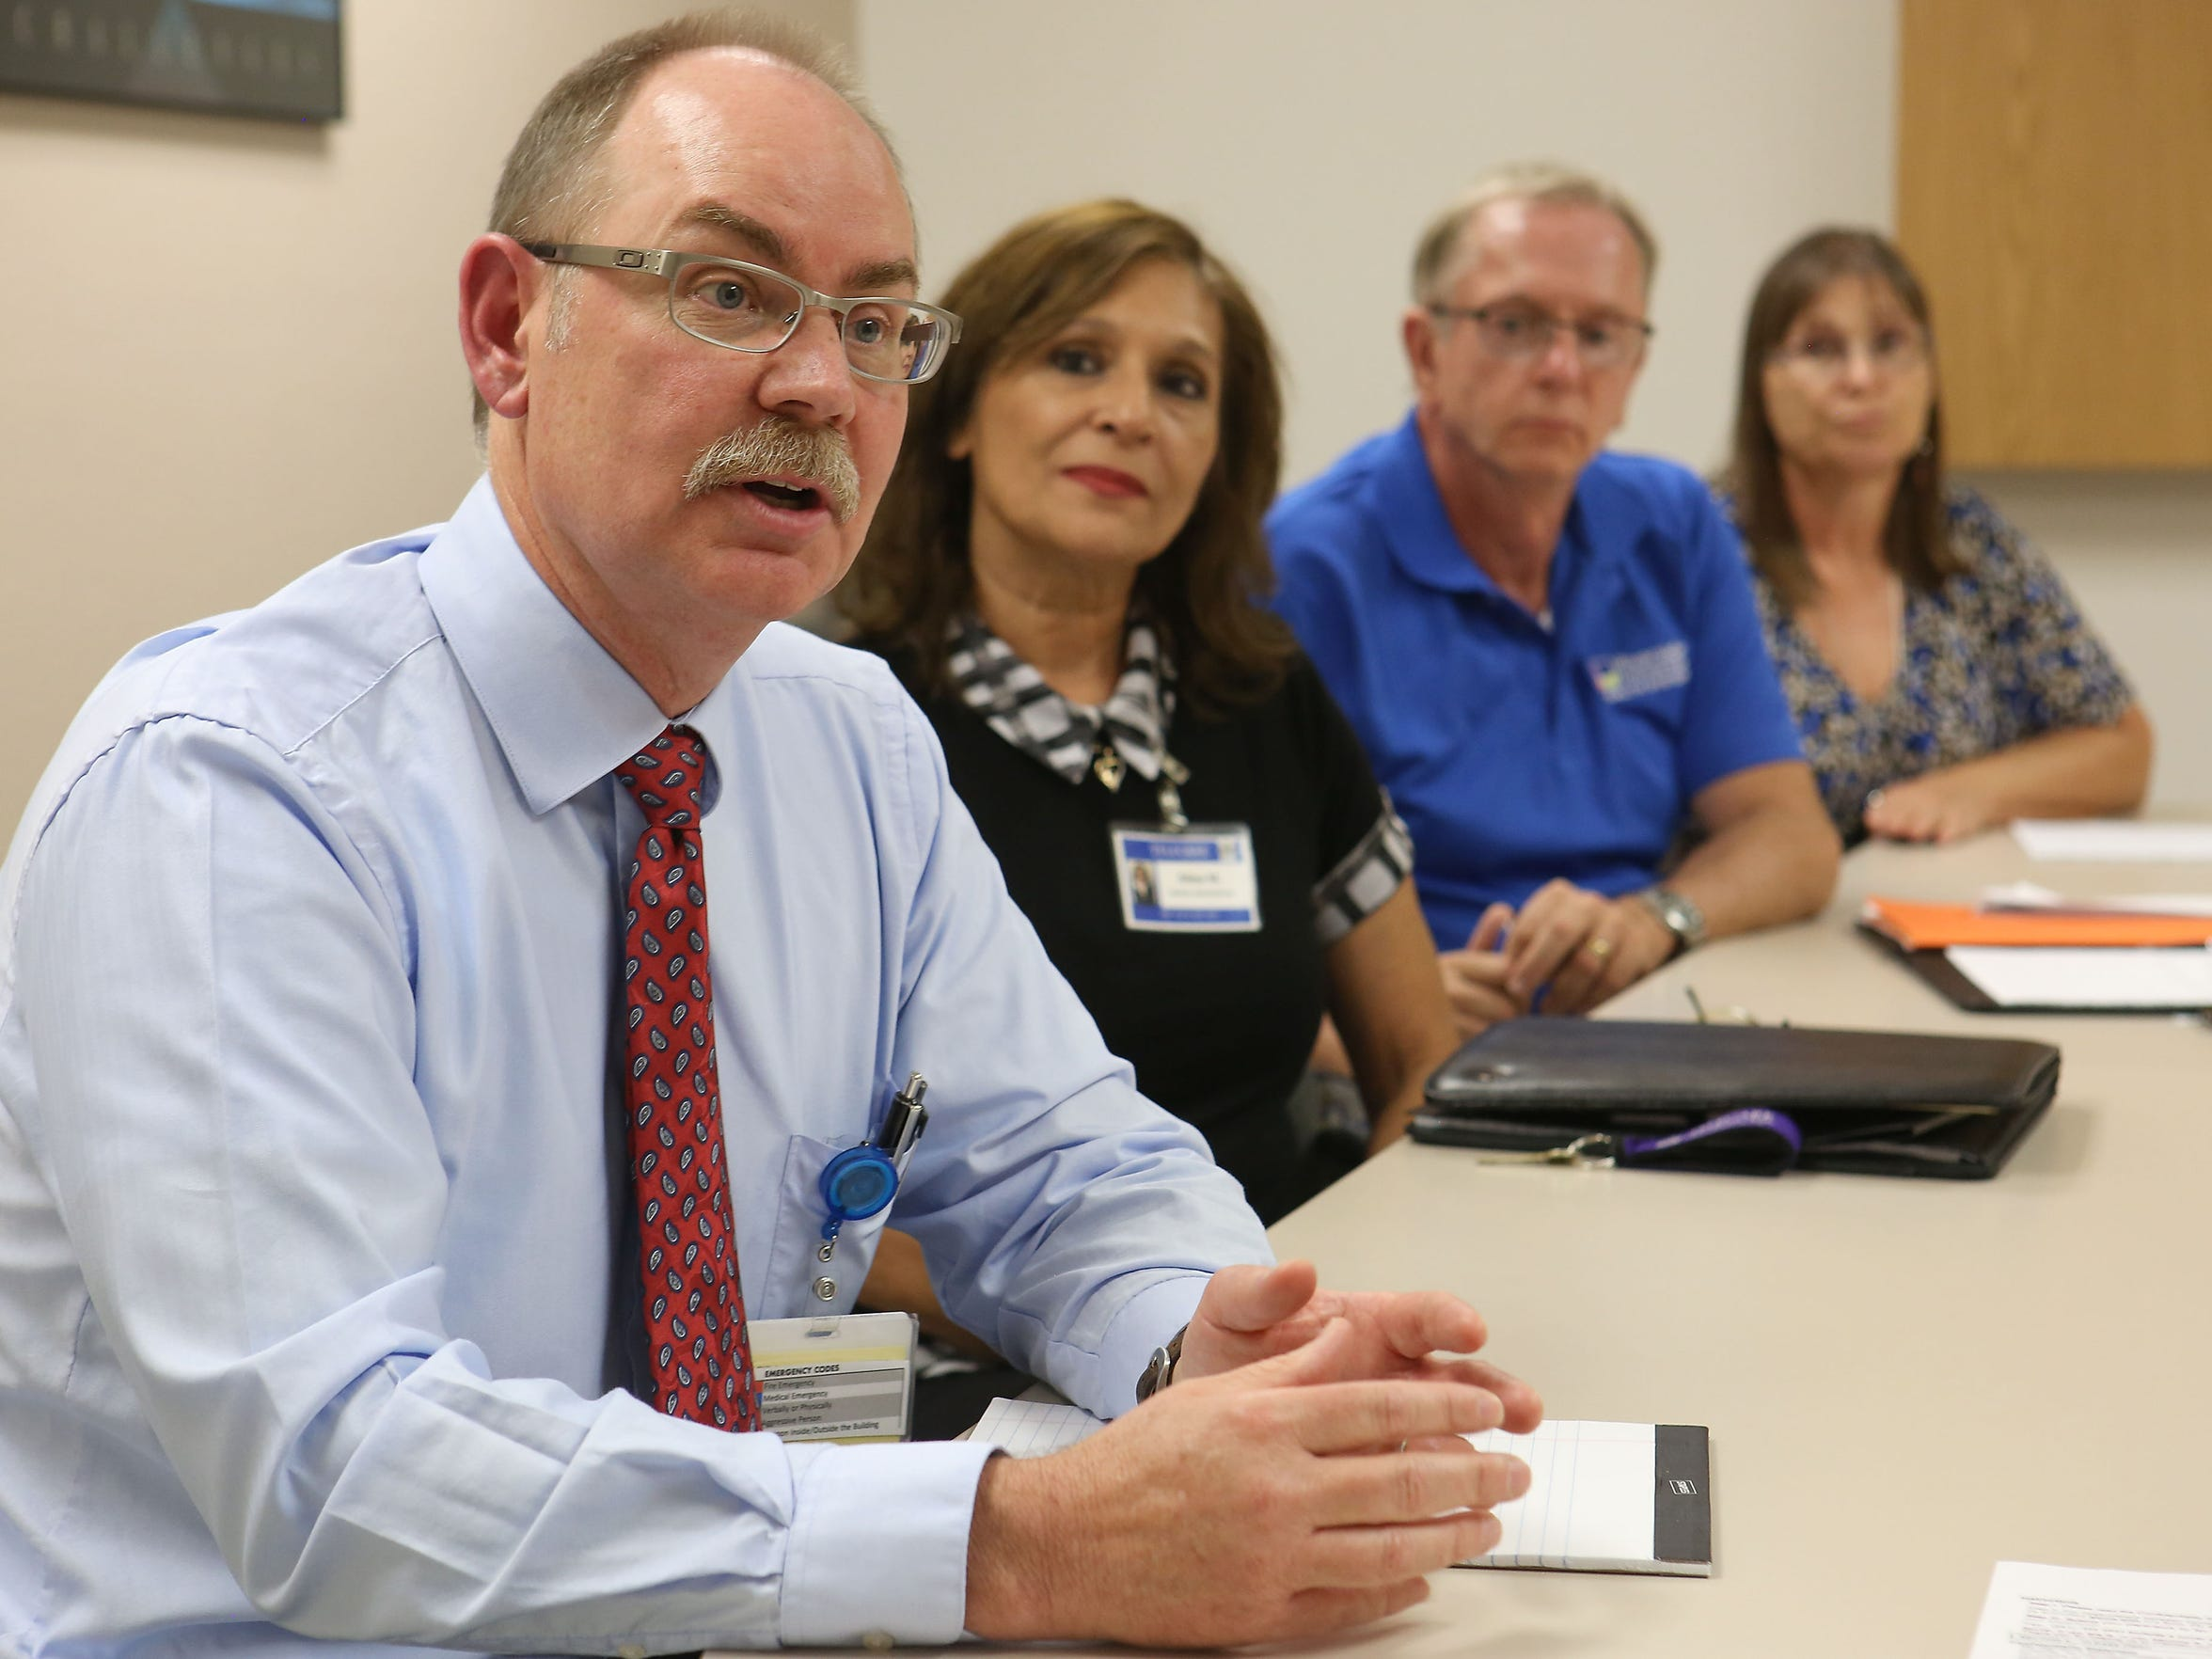 Jim Grisham is the Desert Region Administrator for the Rvierside University Health System - Behavioral Health.